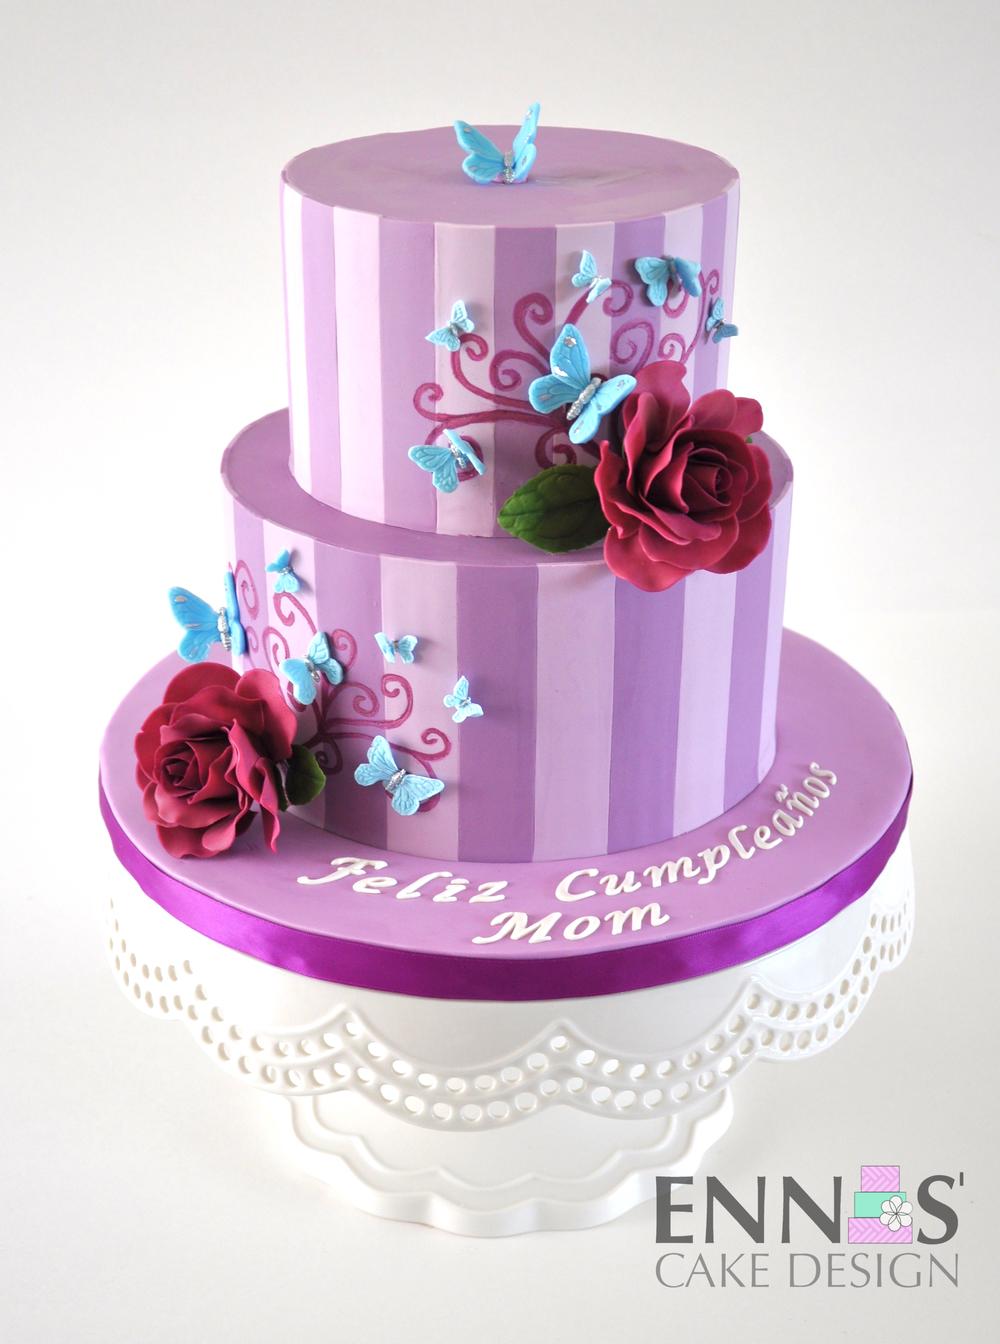 Special Occasion Cakes Ennas Cake Design